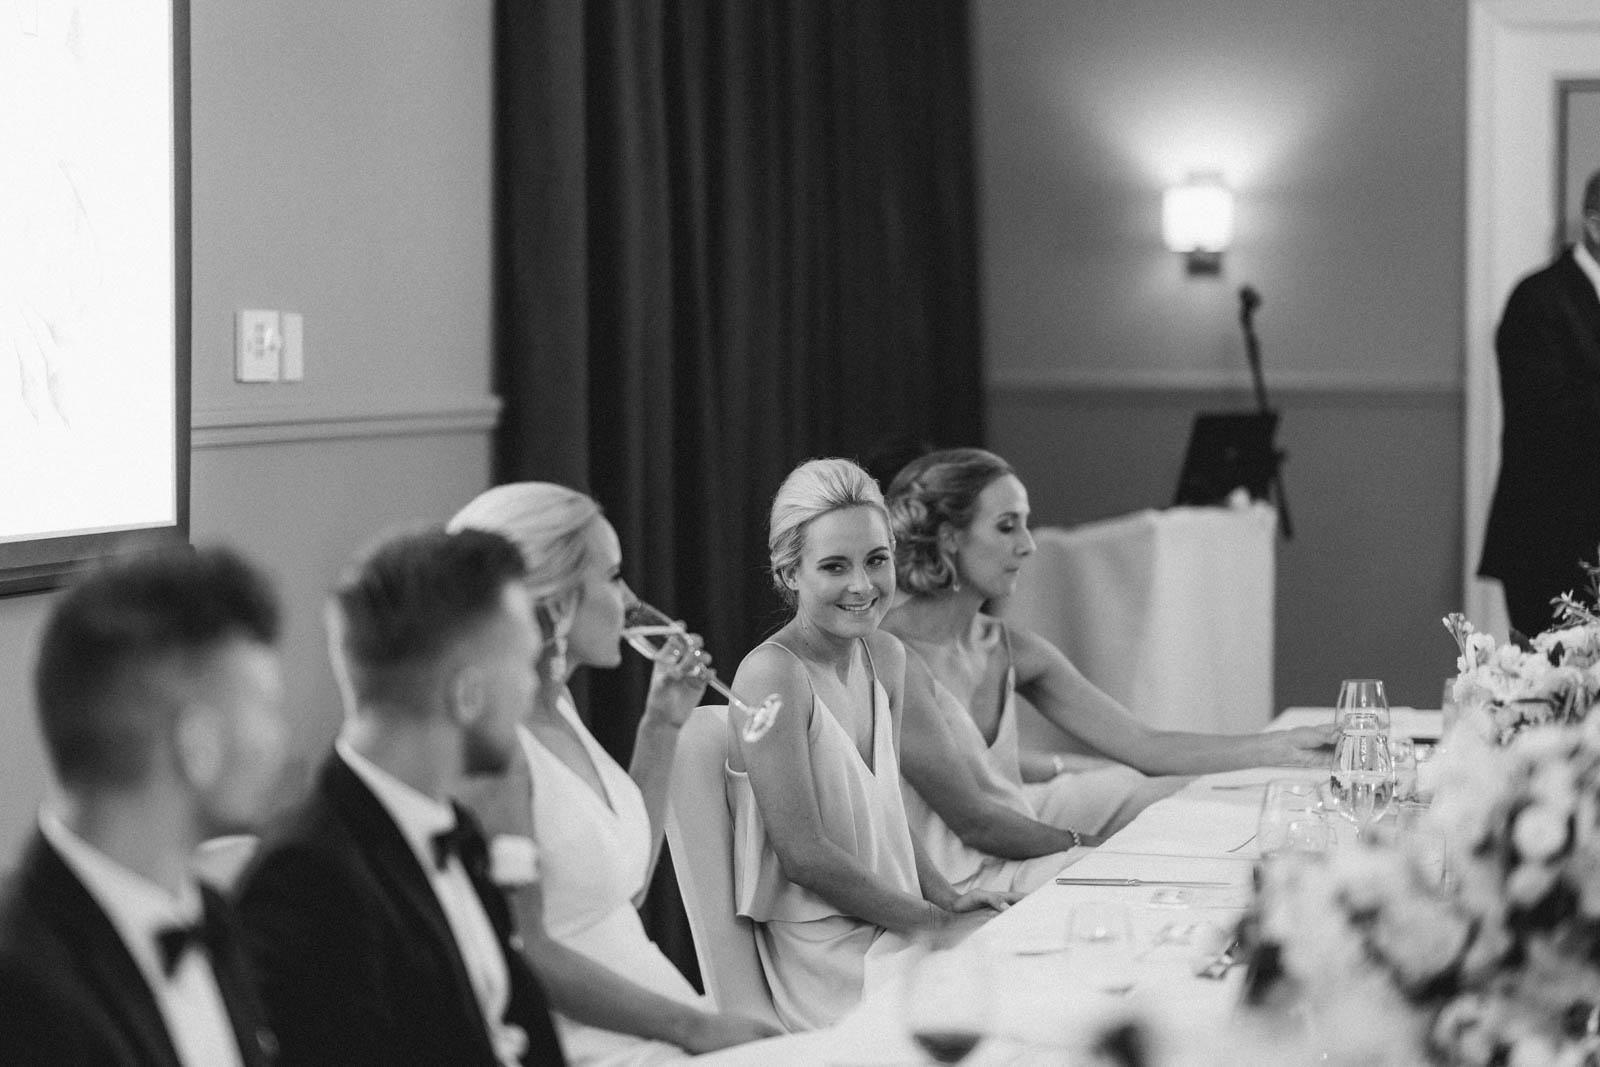 newfound-k-s-hilton-taupo-wedding-photographer-105